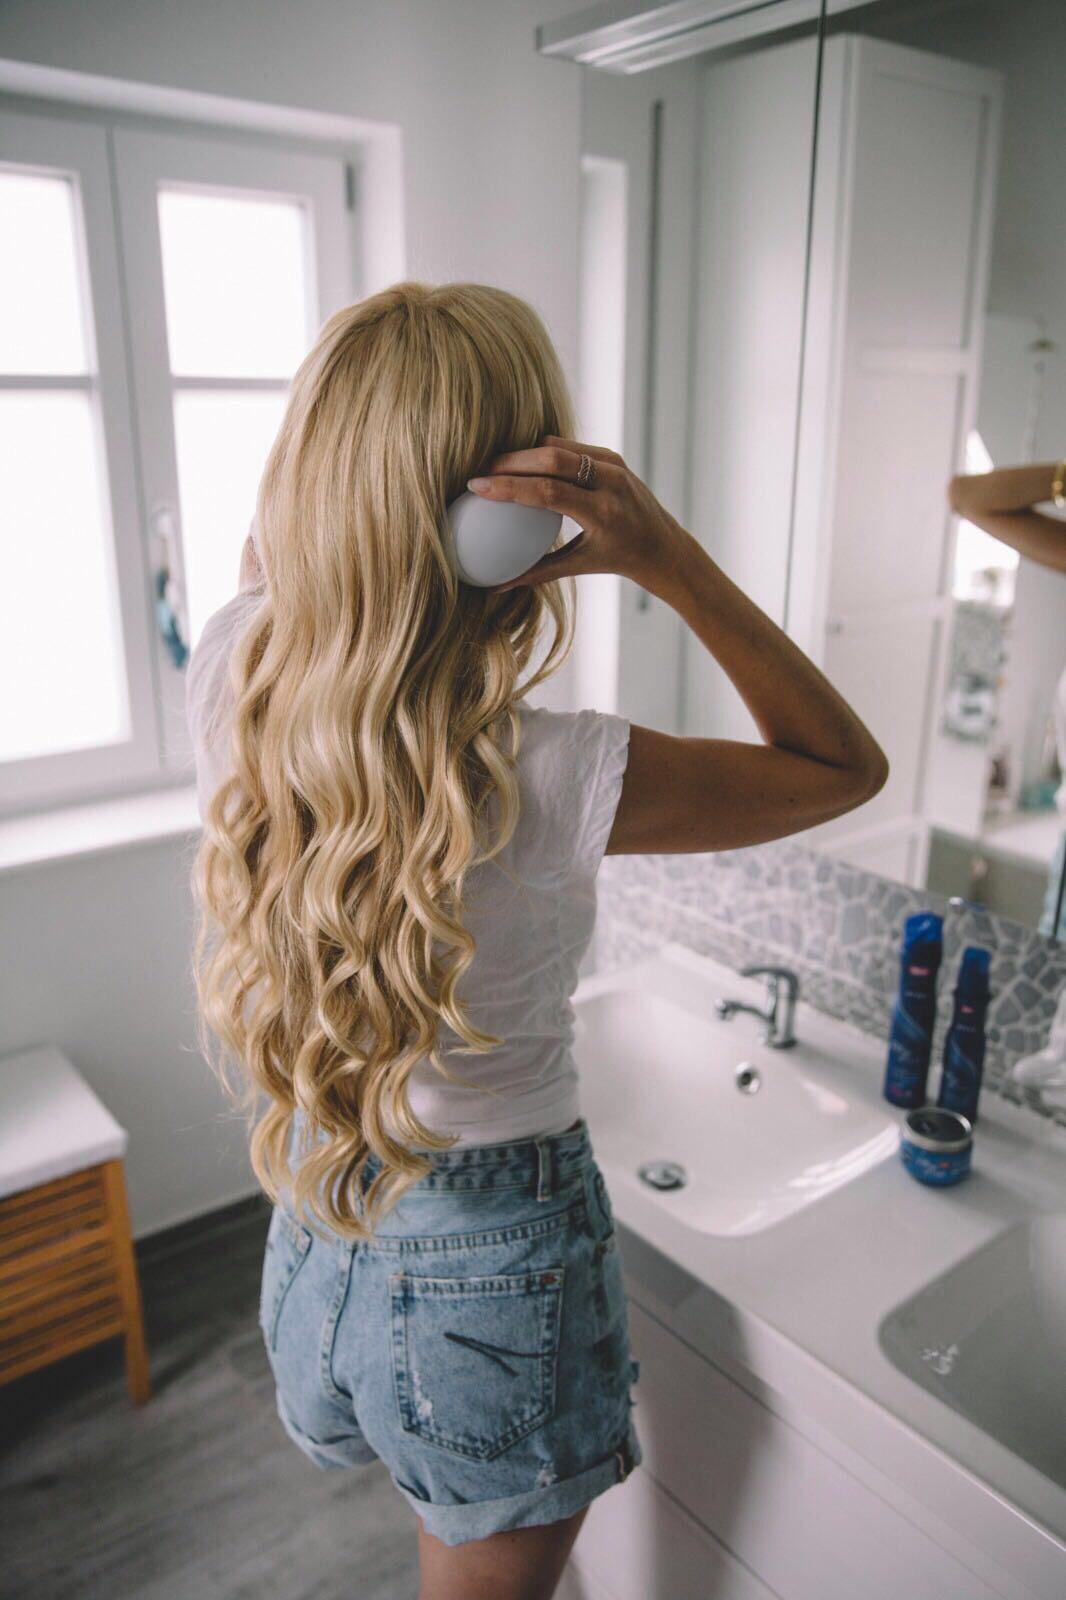 Lange Haare Spitzen Schneiden Anleitung Mittellange Haare